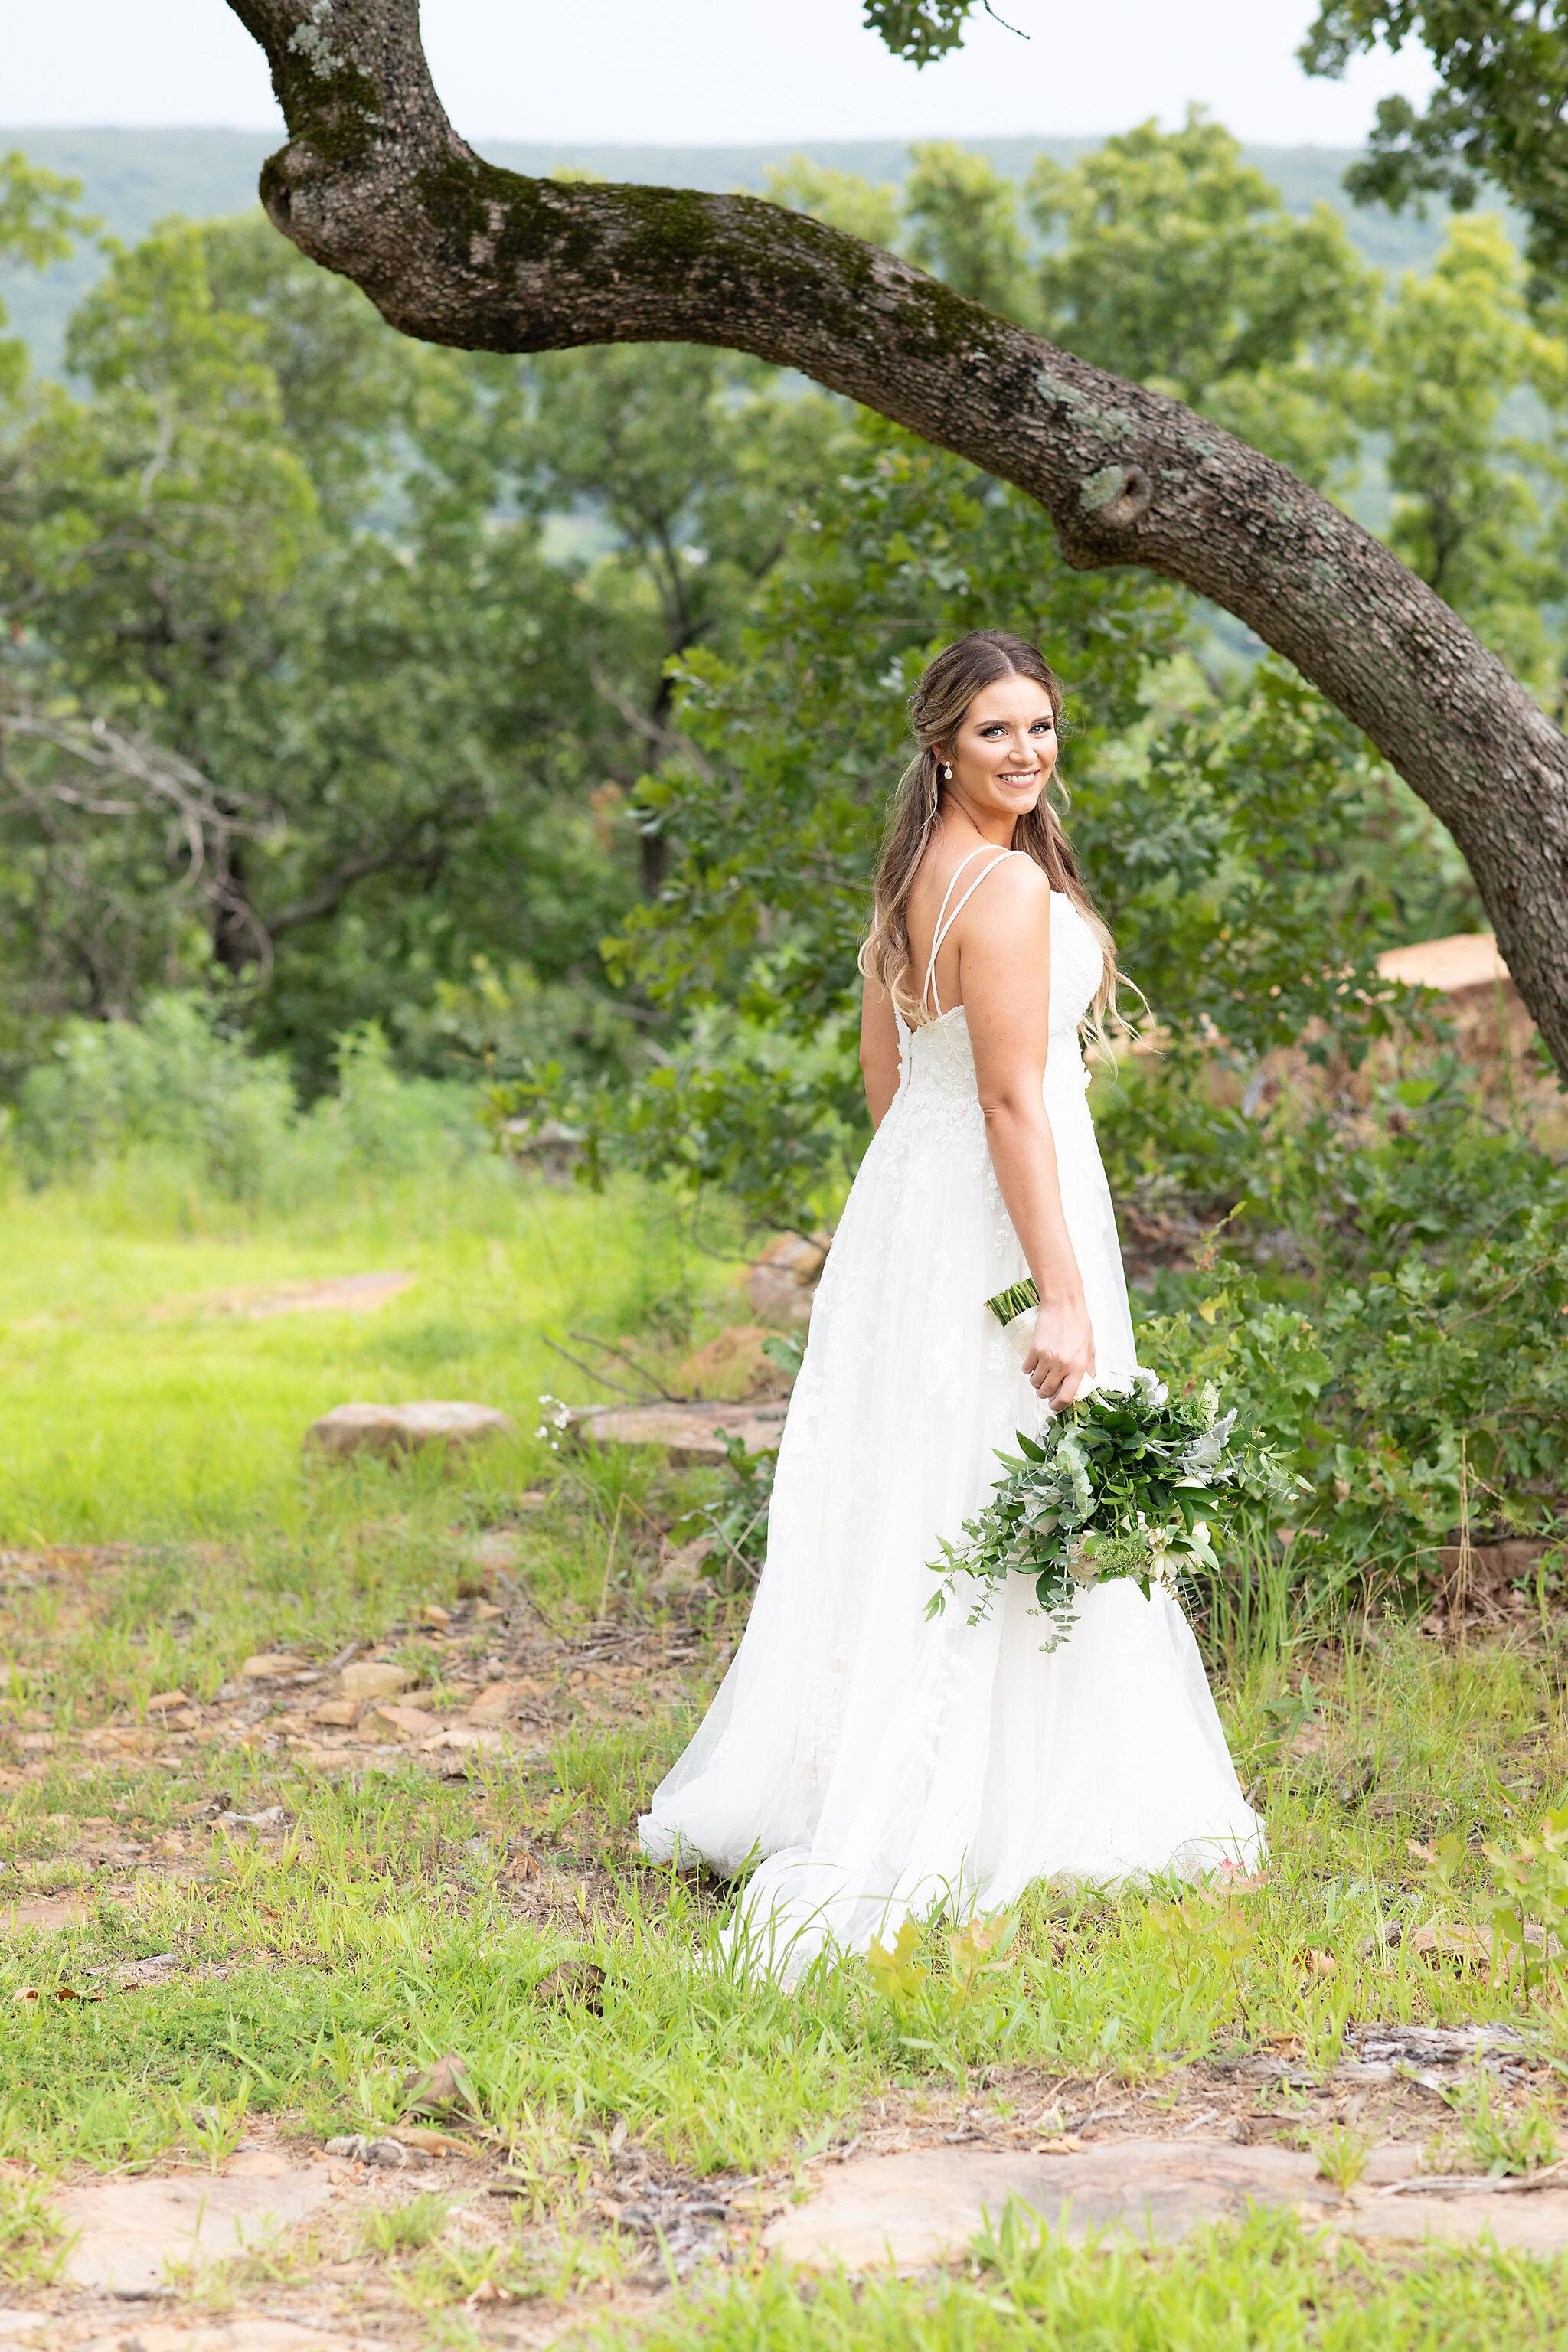 Oklahoma Summer Wedding Venue Dream Point Ranch 13f.jpg